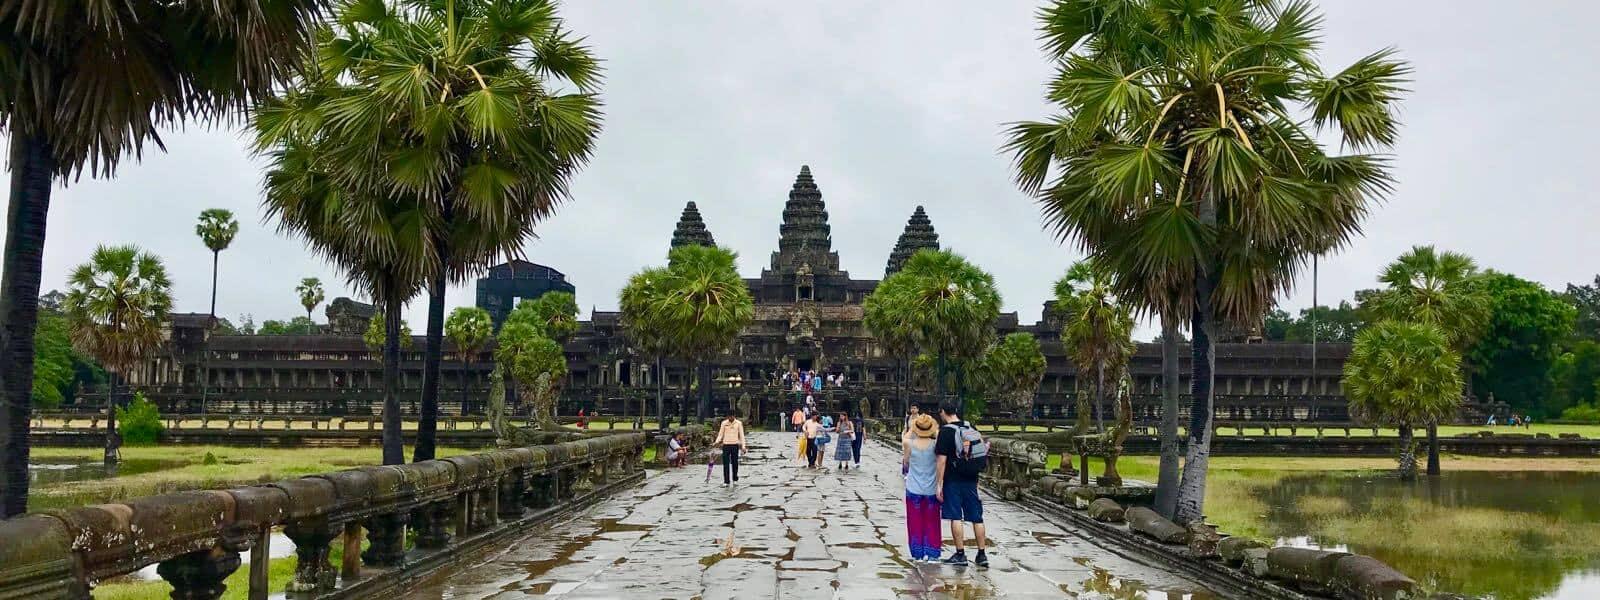 Angkor Wat Cambodia betternotstop